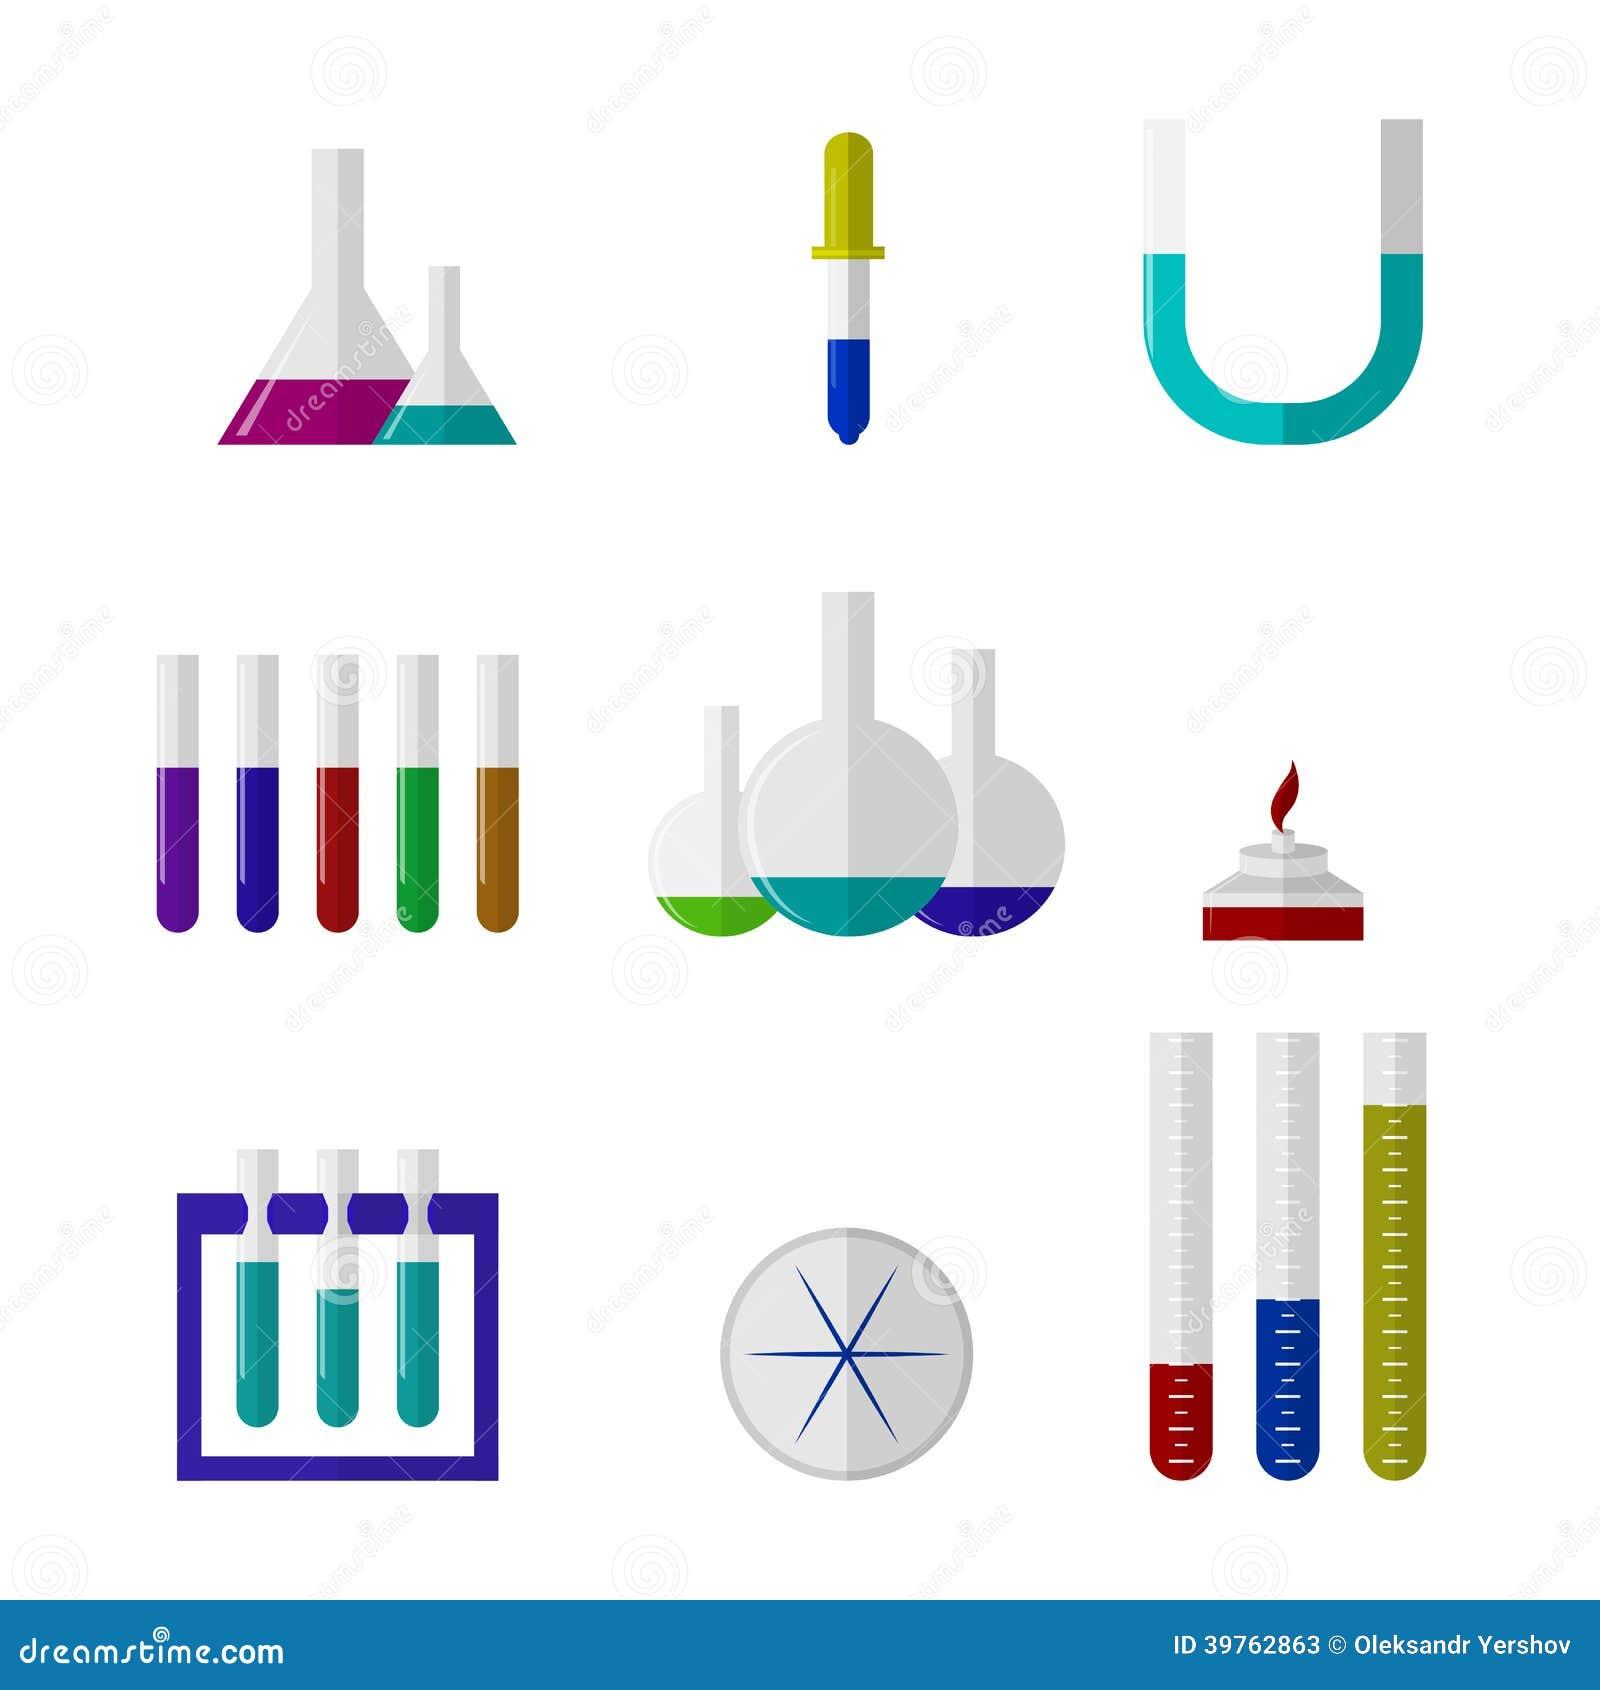 liquid template filters - labware cartoons illustrations vector stock images 40